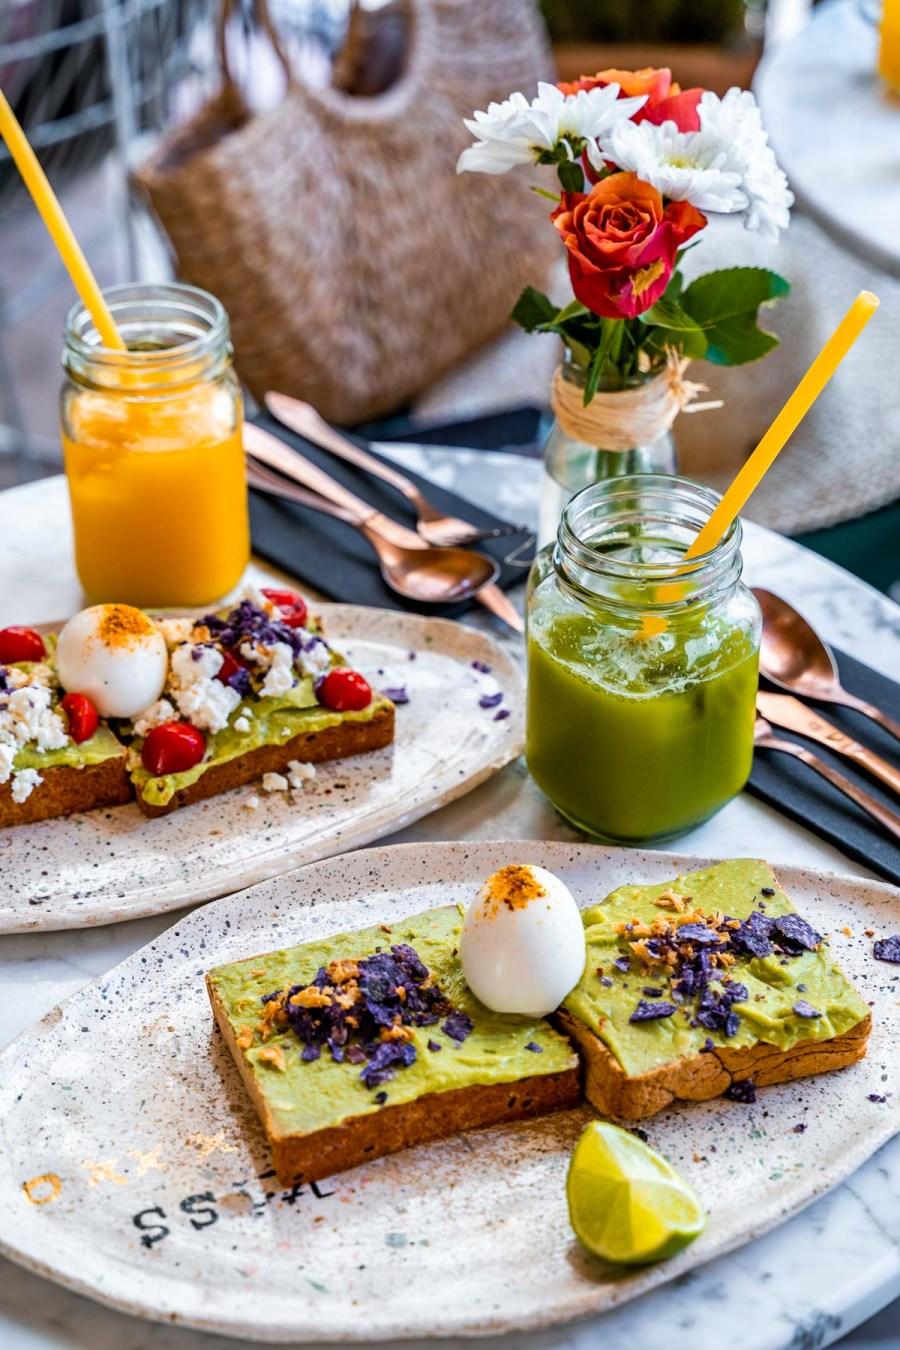 Breakfast at Eola in Monaco